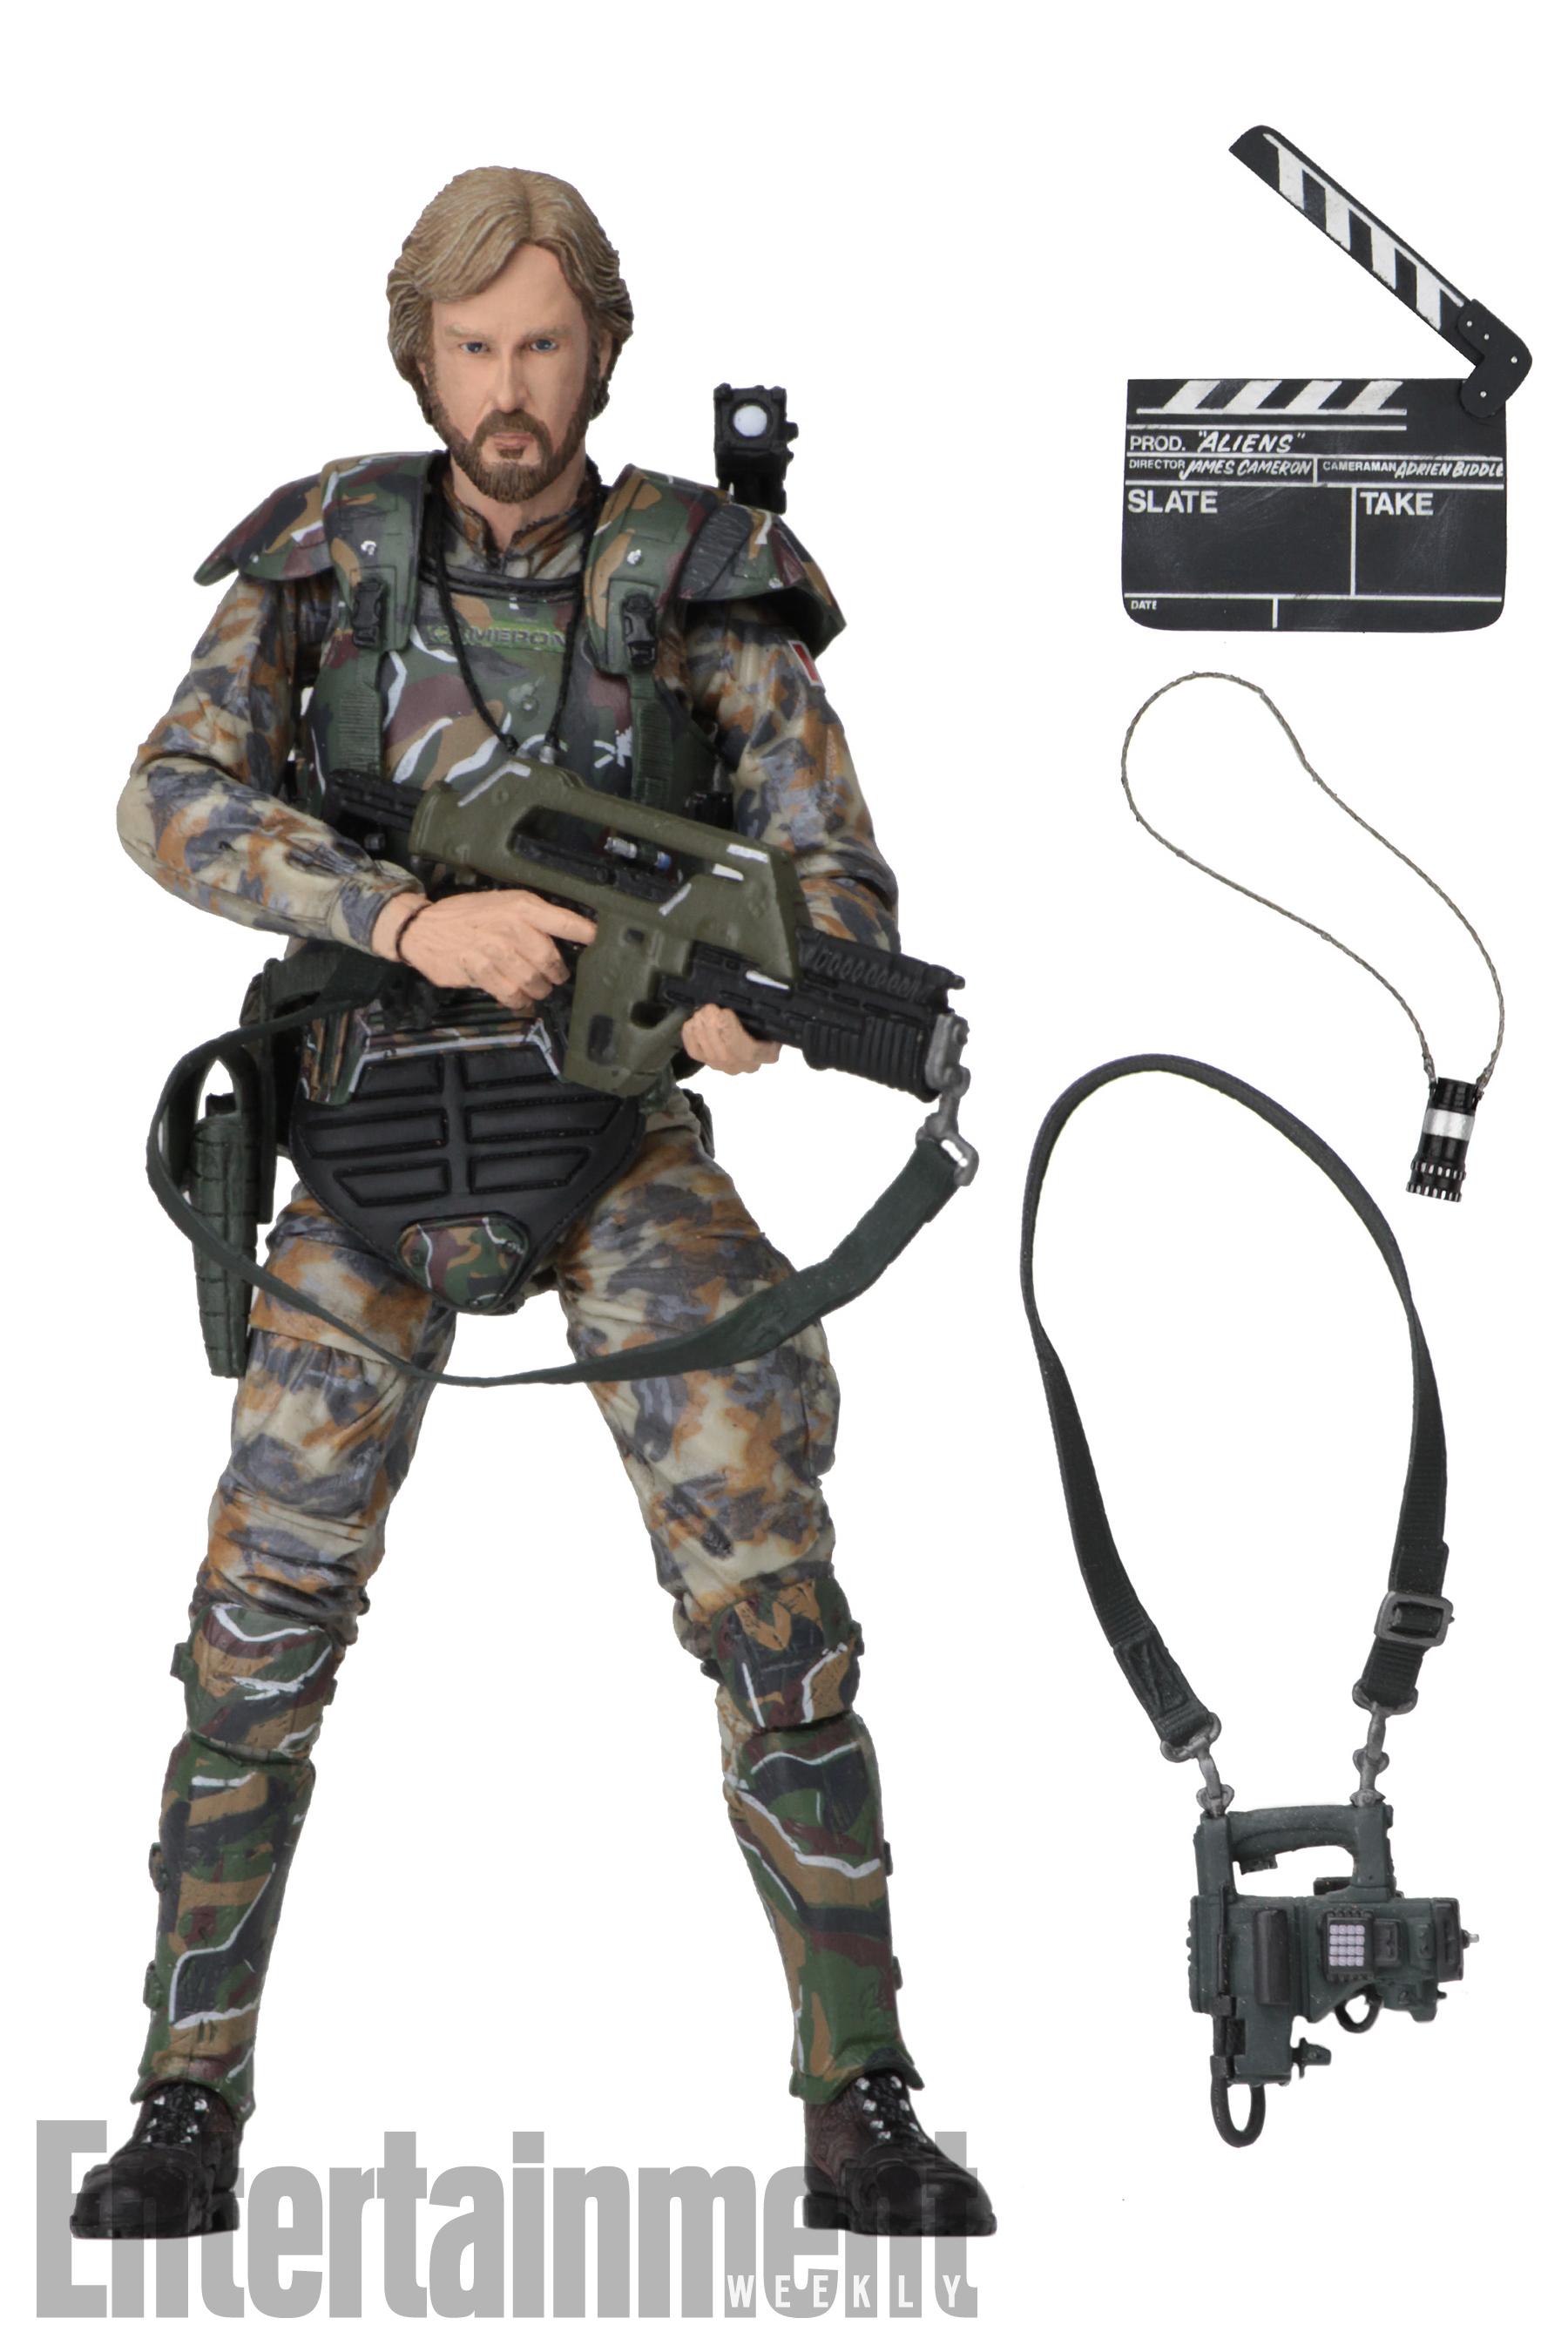 NECA's Announces Colonel James Cameron Figure!